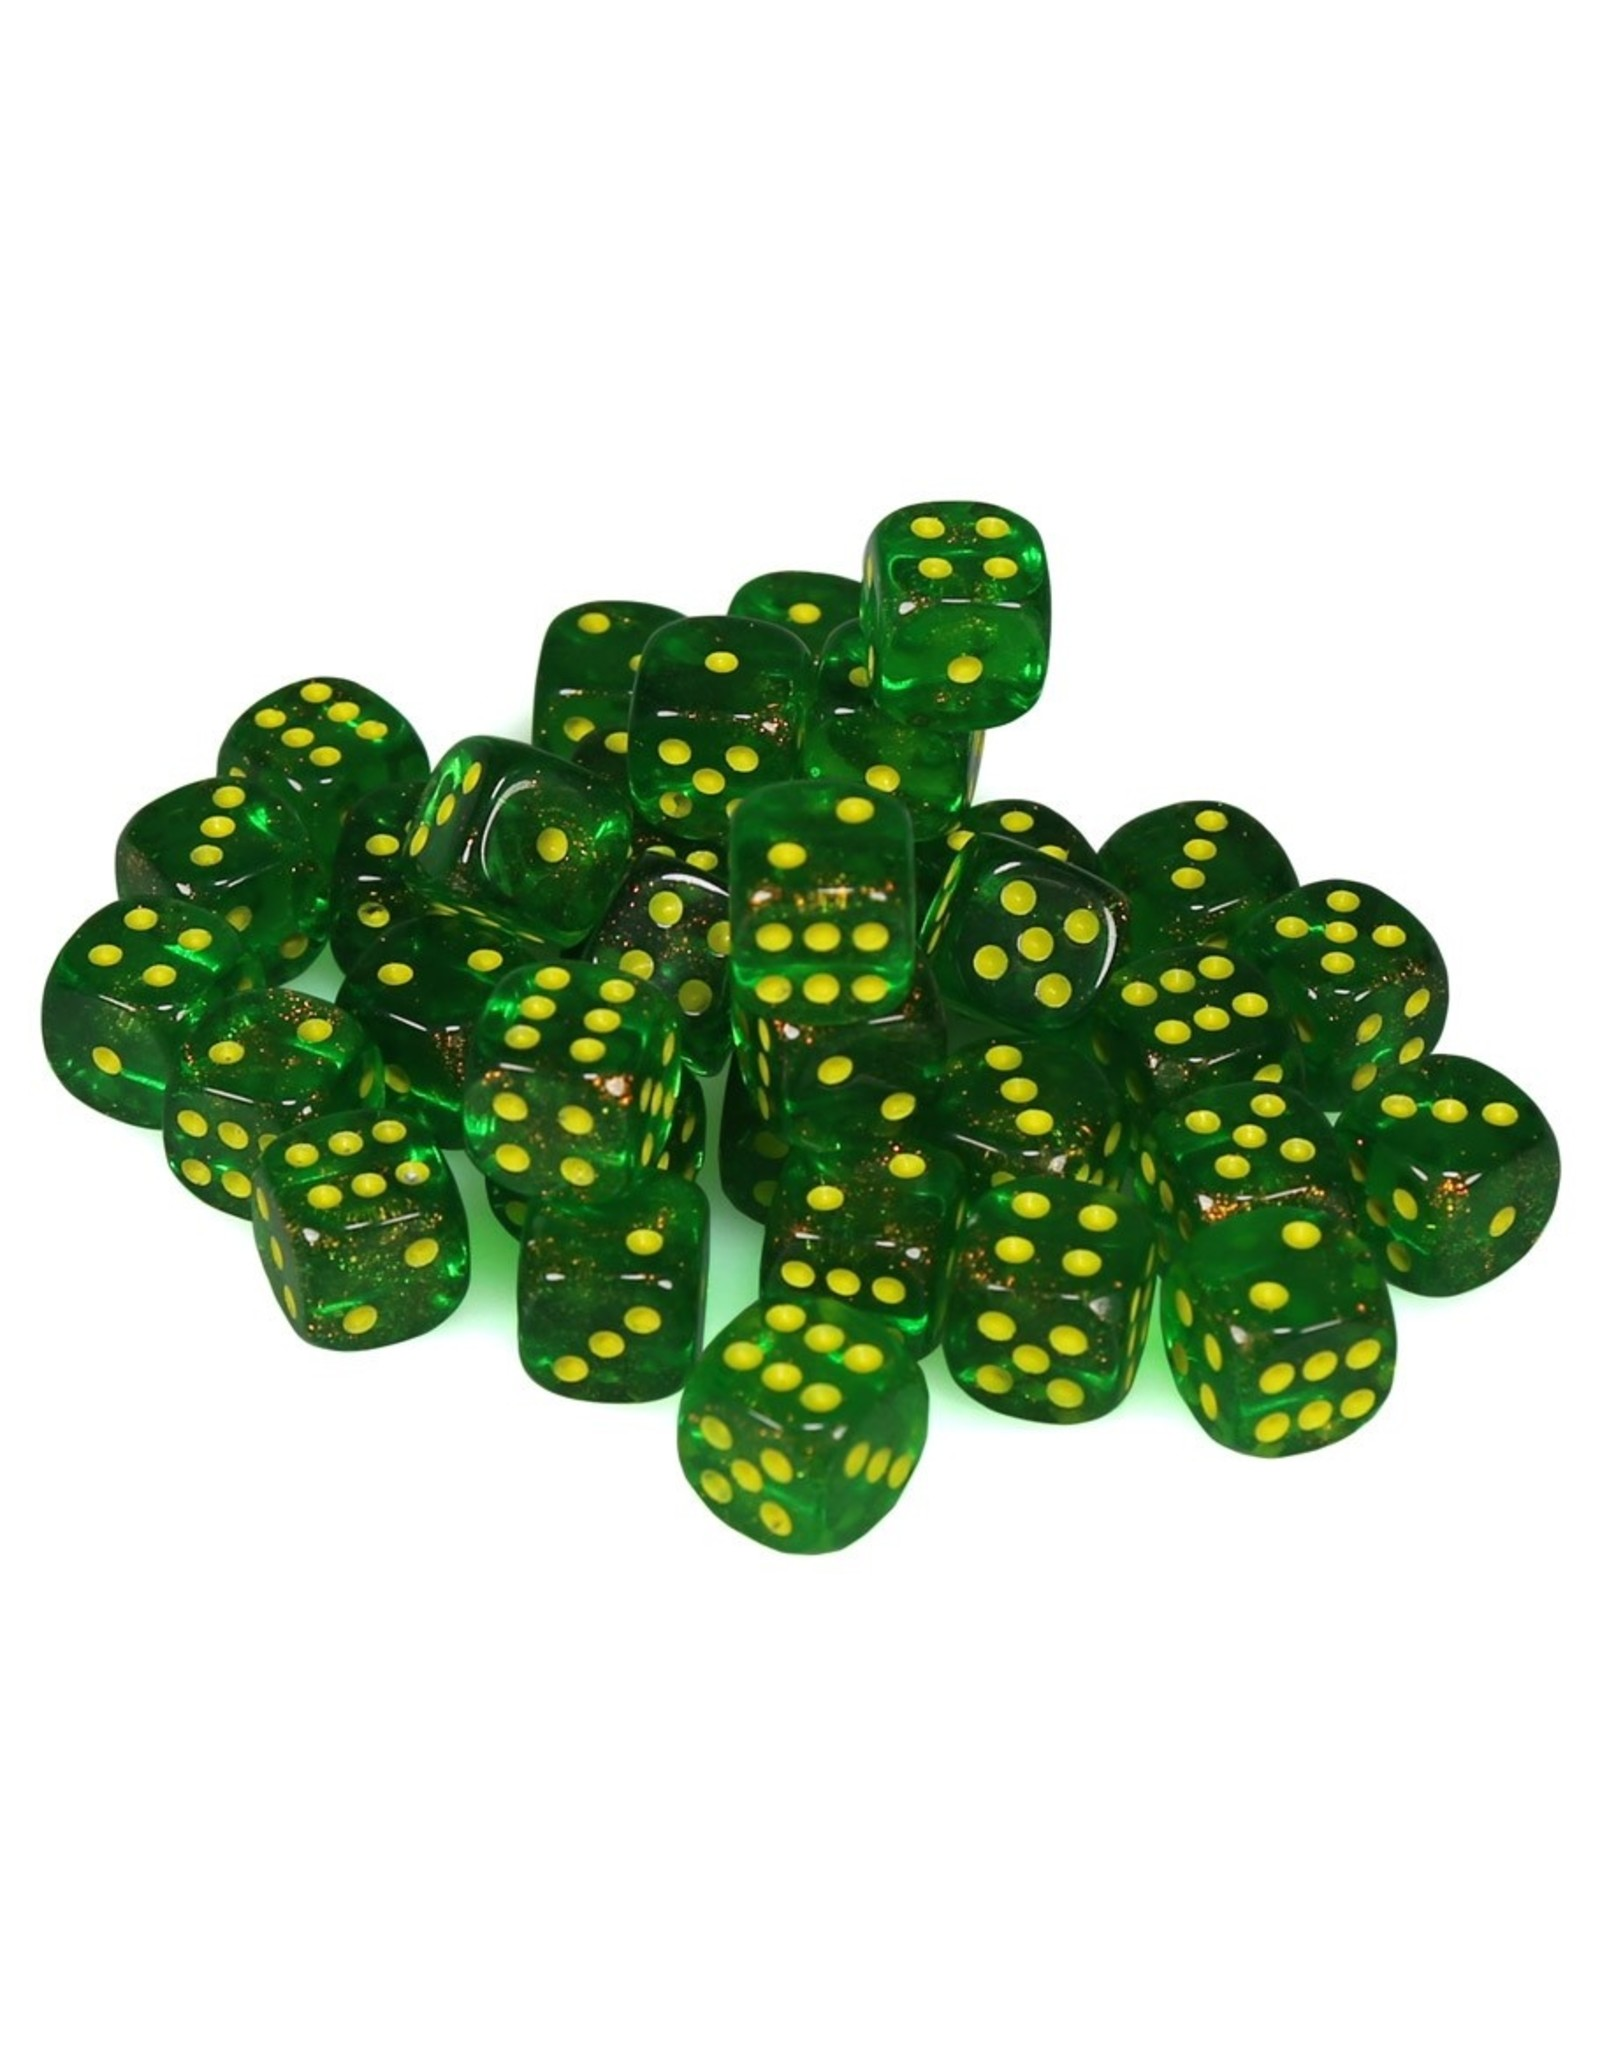 Chessex Chessex: d6Cube 12mm: Borealis - Maple Green/Yellow